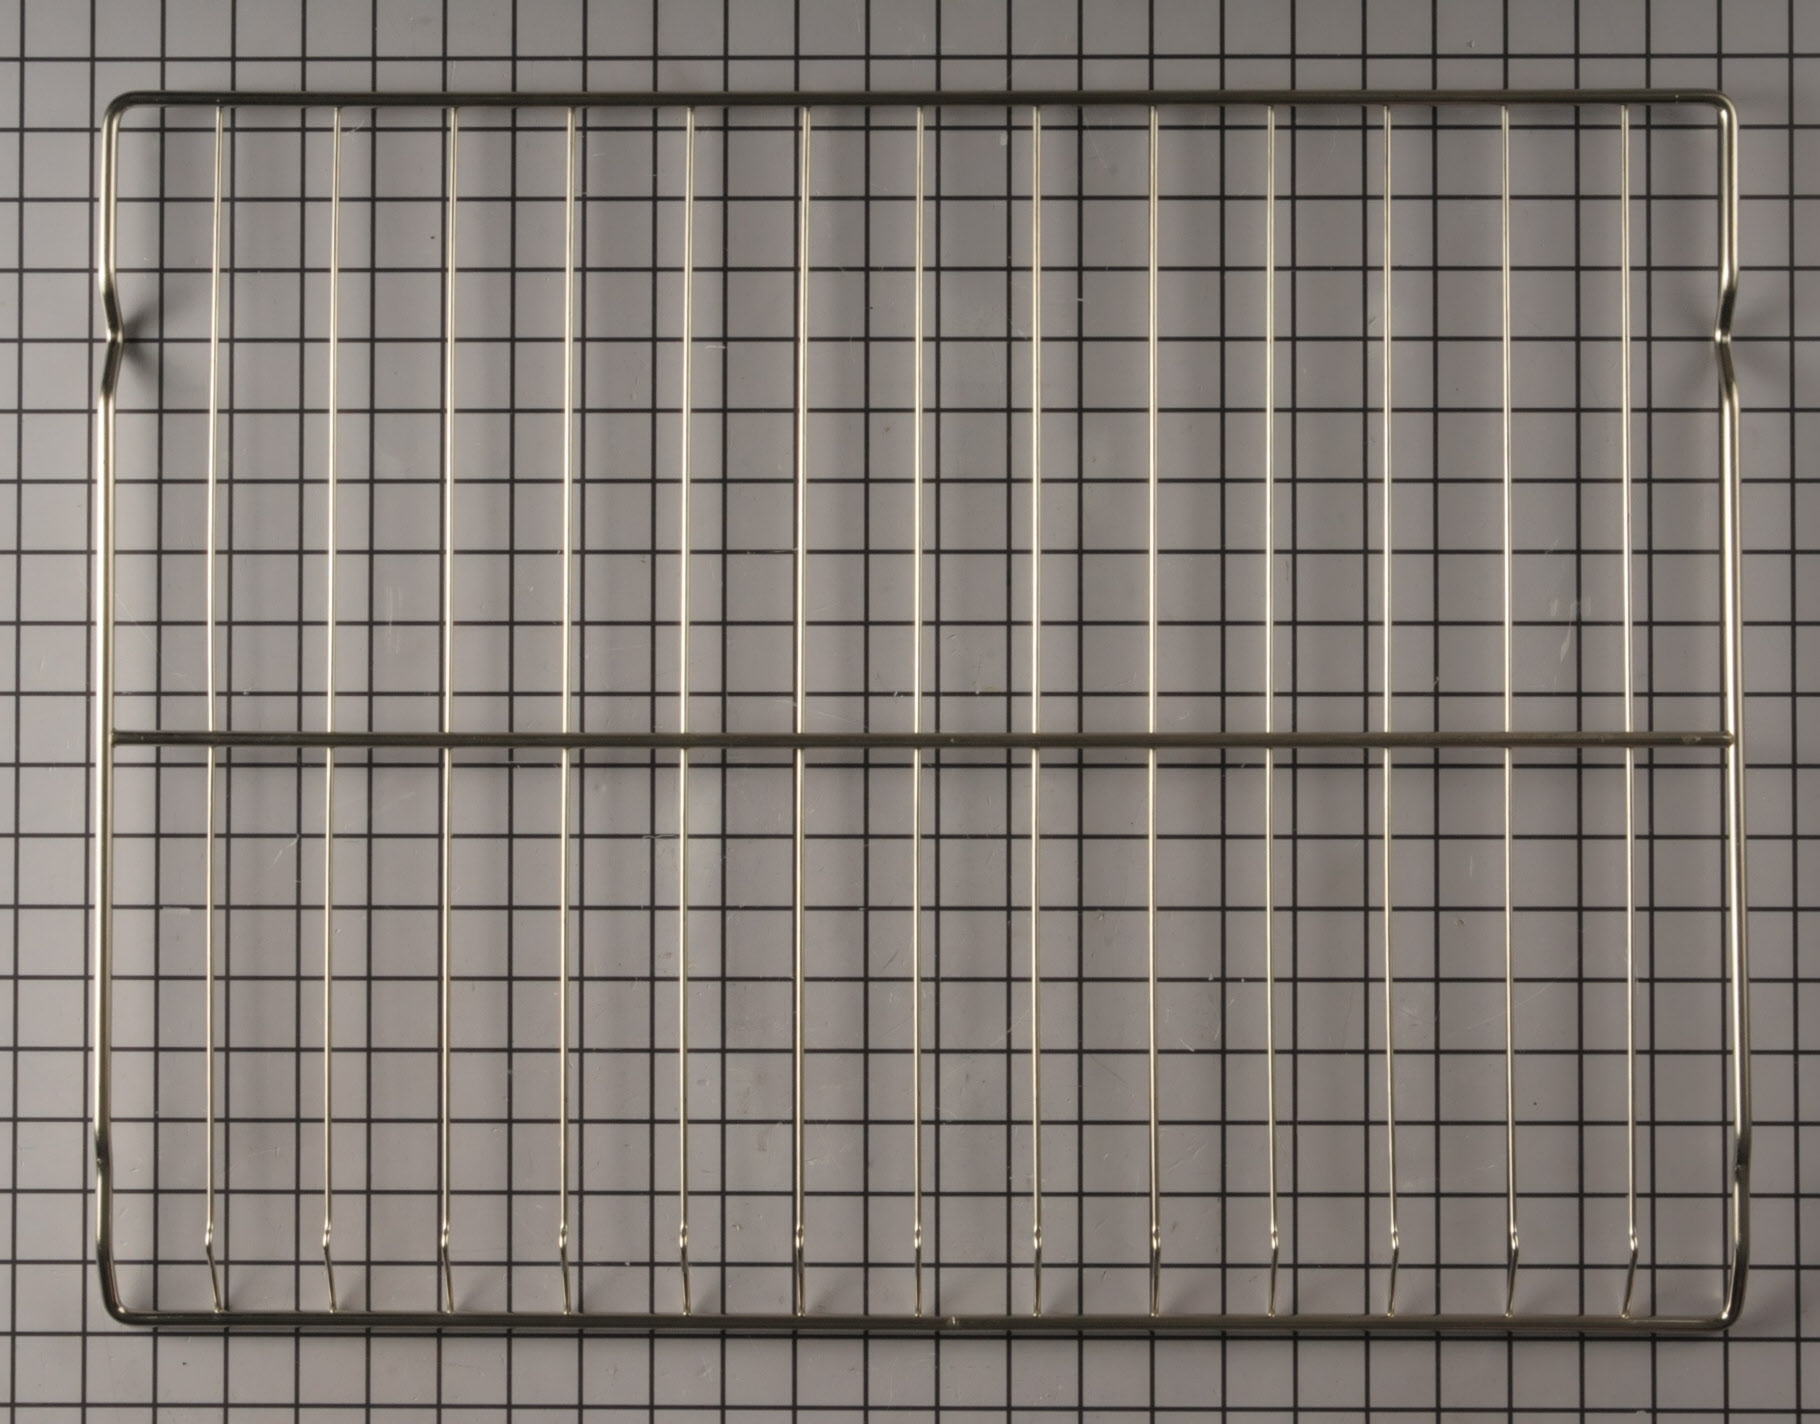 Ikea Range/Stove/Oven Part # WPW10282492 - Rack